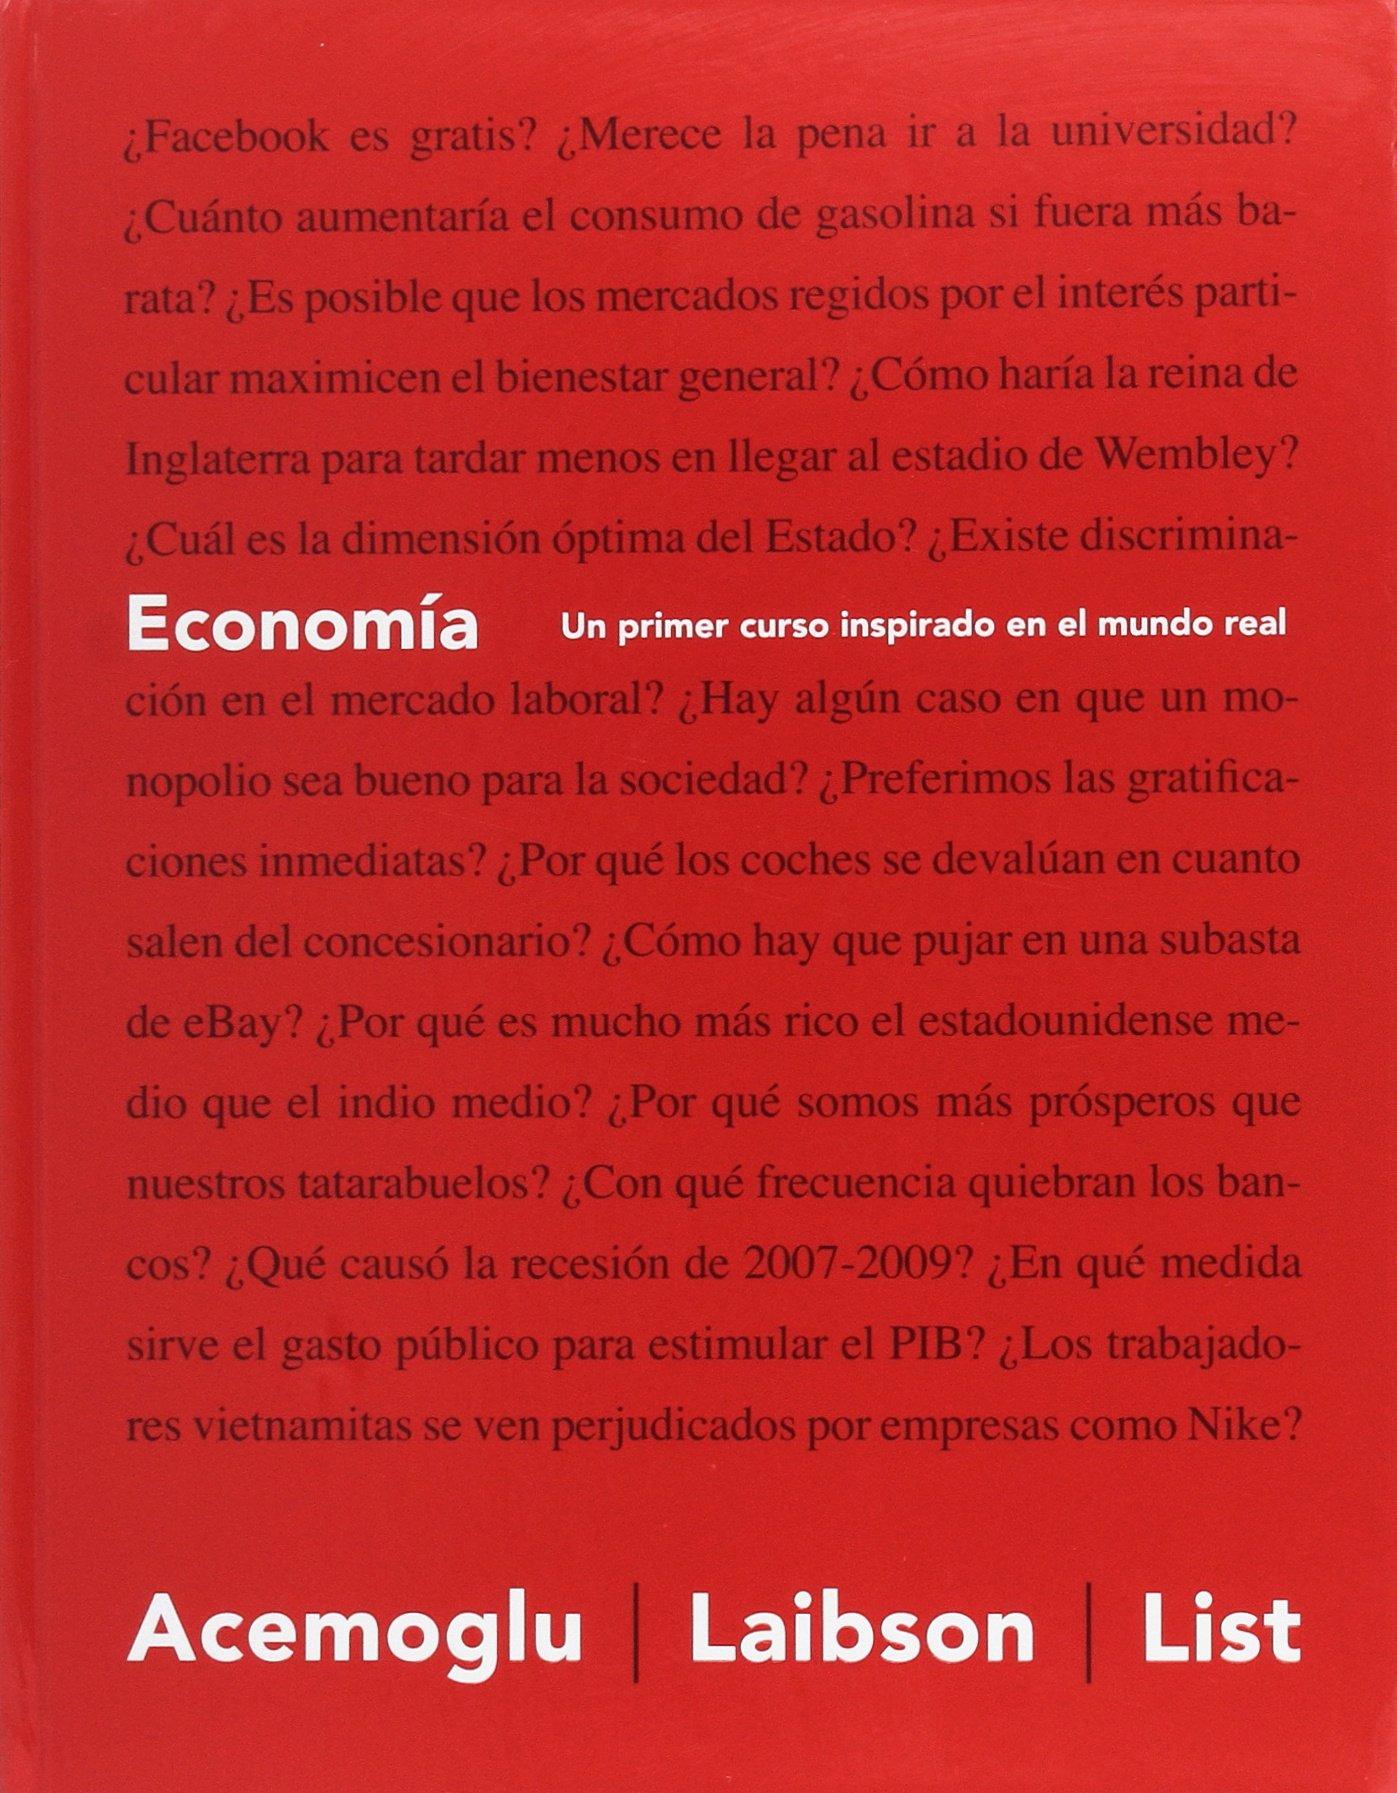 Economía: Un primer curso inspirado en el mundo real: Amazon.es: Acemoglu, Daron, Laibson, David, List, John A., Otero Piñeiro, María Dulcinea, Izquierdo Tapia, José María: Libros